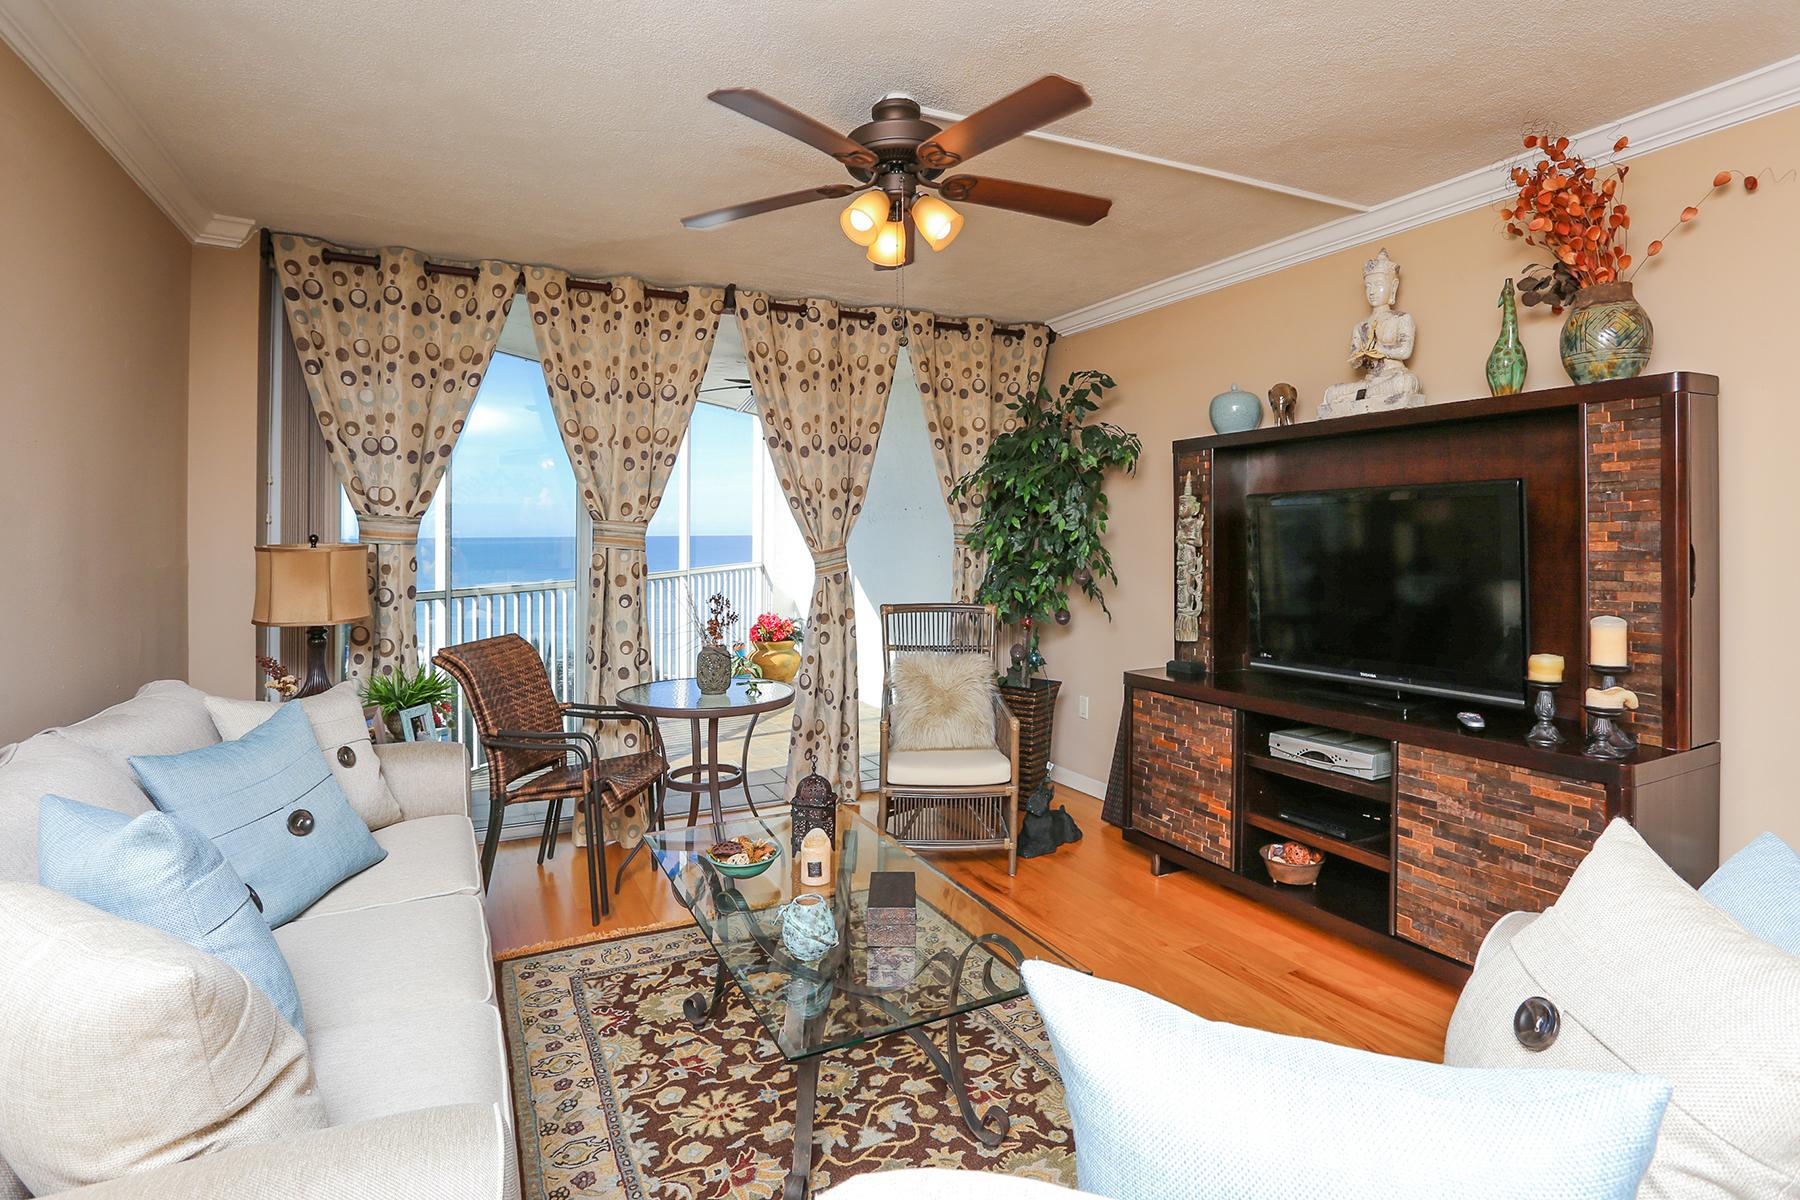 Condominium for Rent at SARASOTA - LIDO HAROUR TOWERS 1770 Ben Franklin Dr 603 Sarasota, Florida 34236 United States